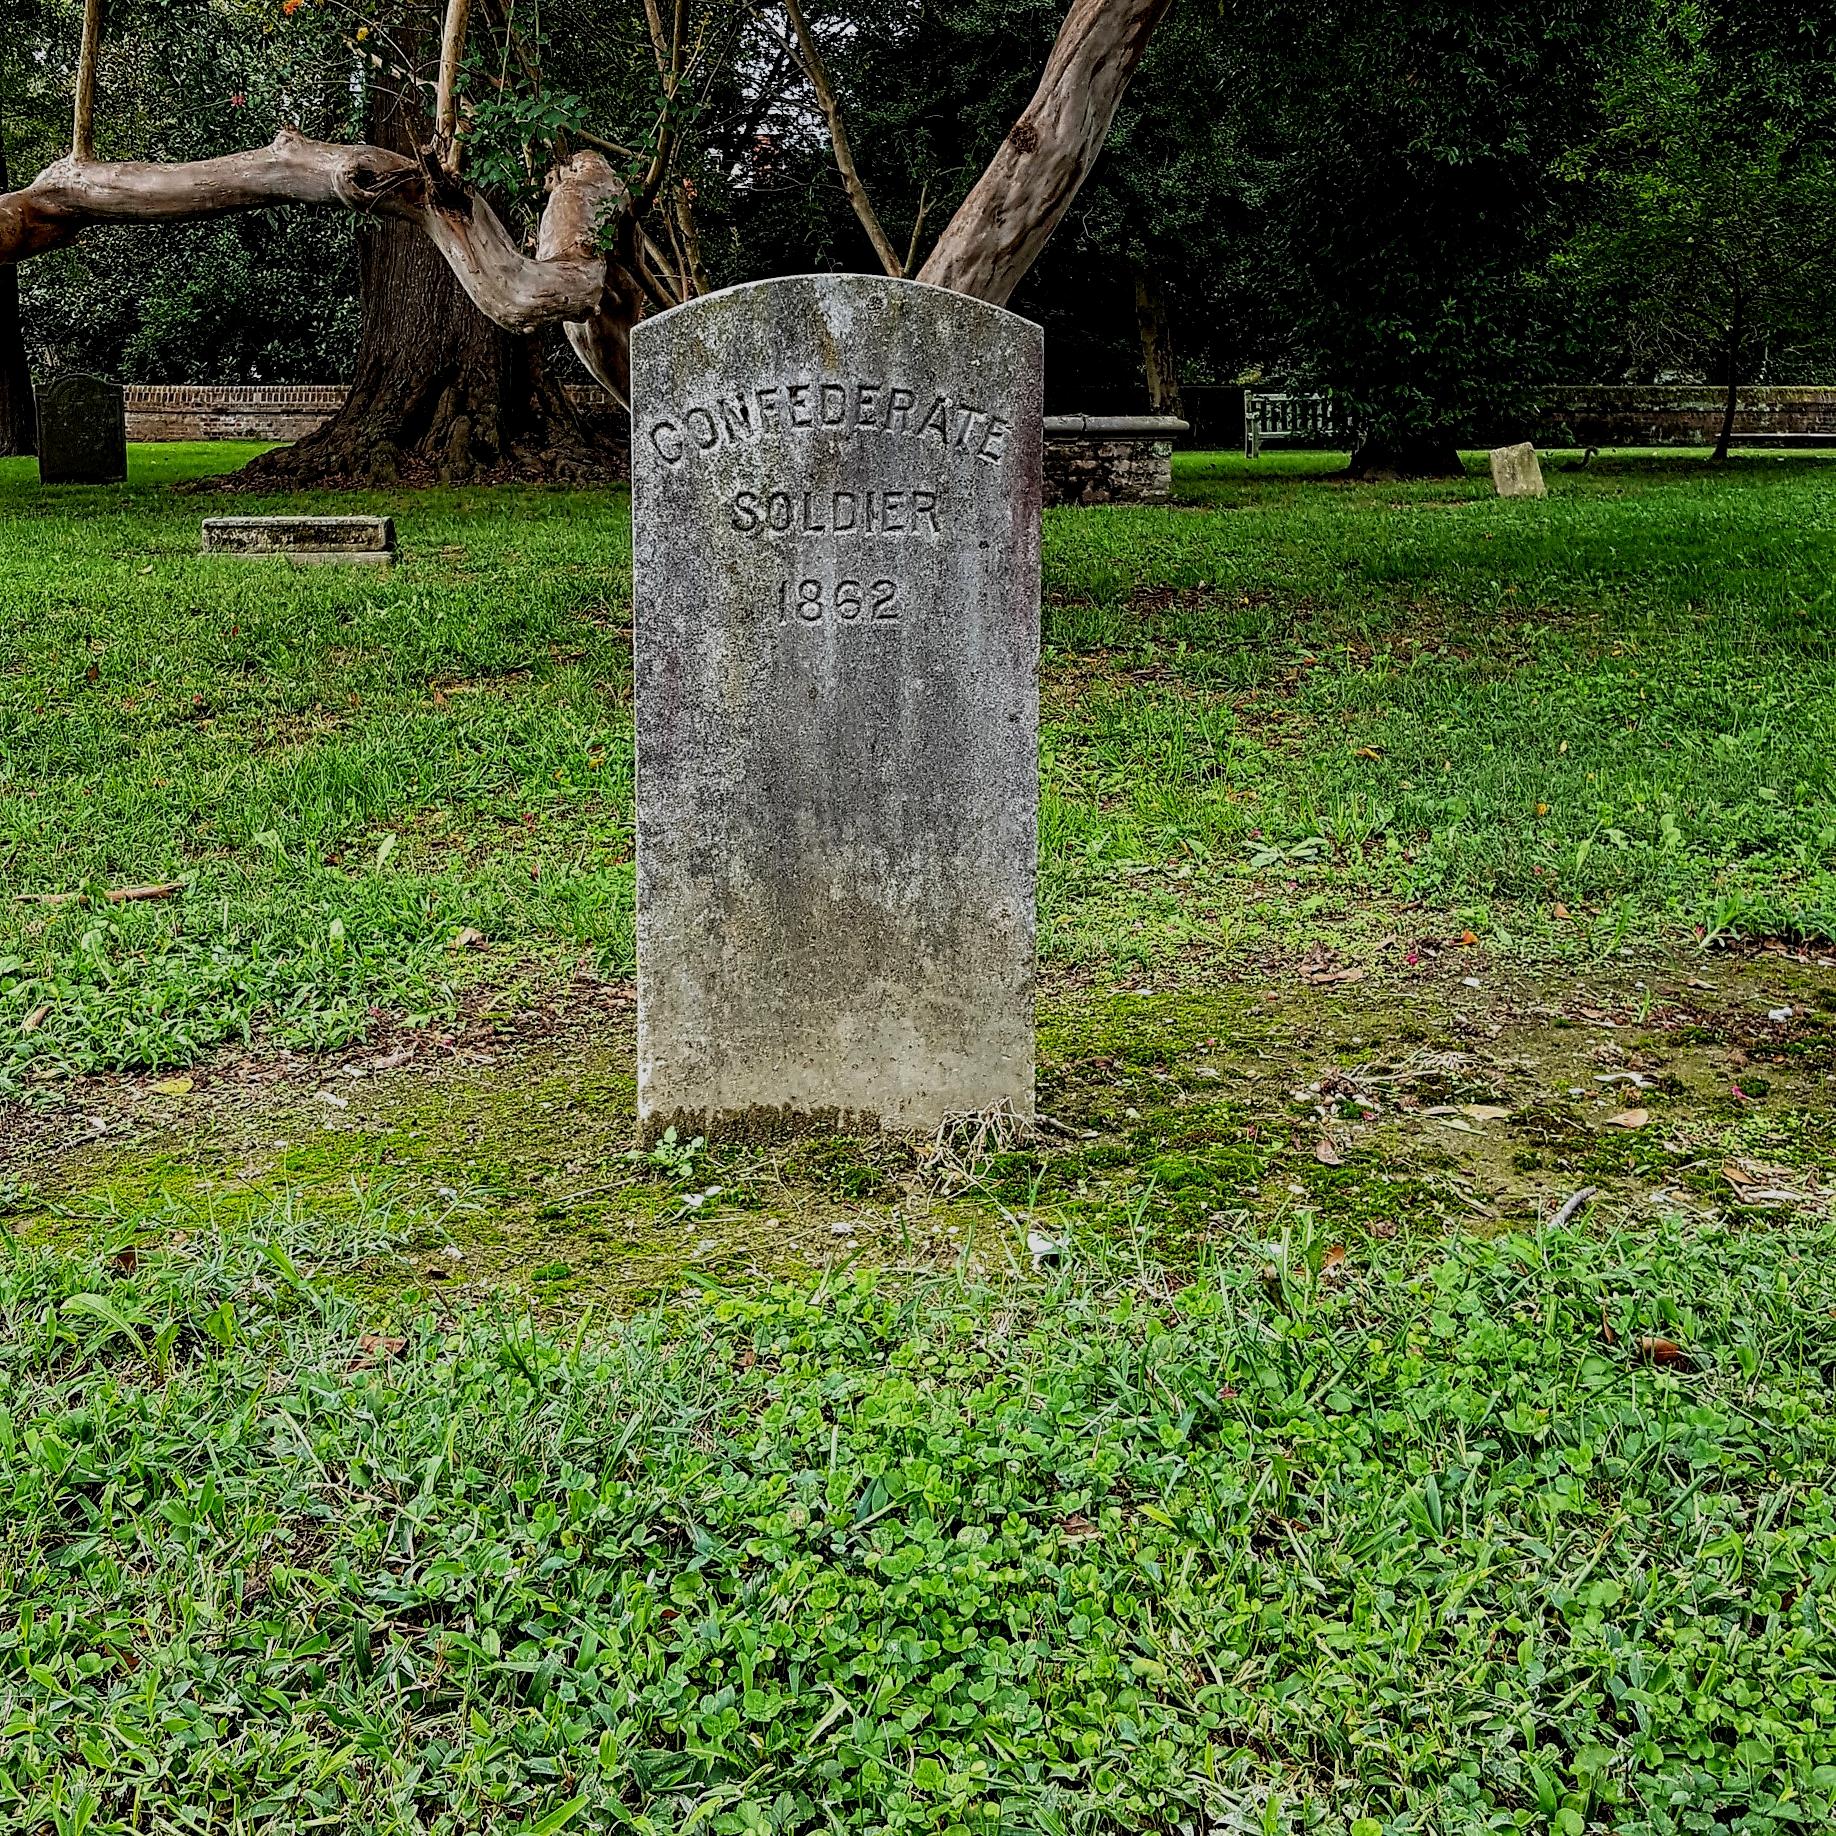 Confederate Soldier - Church Graveyard